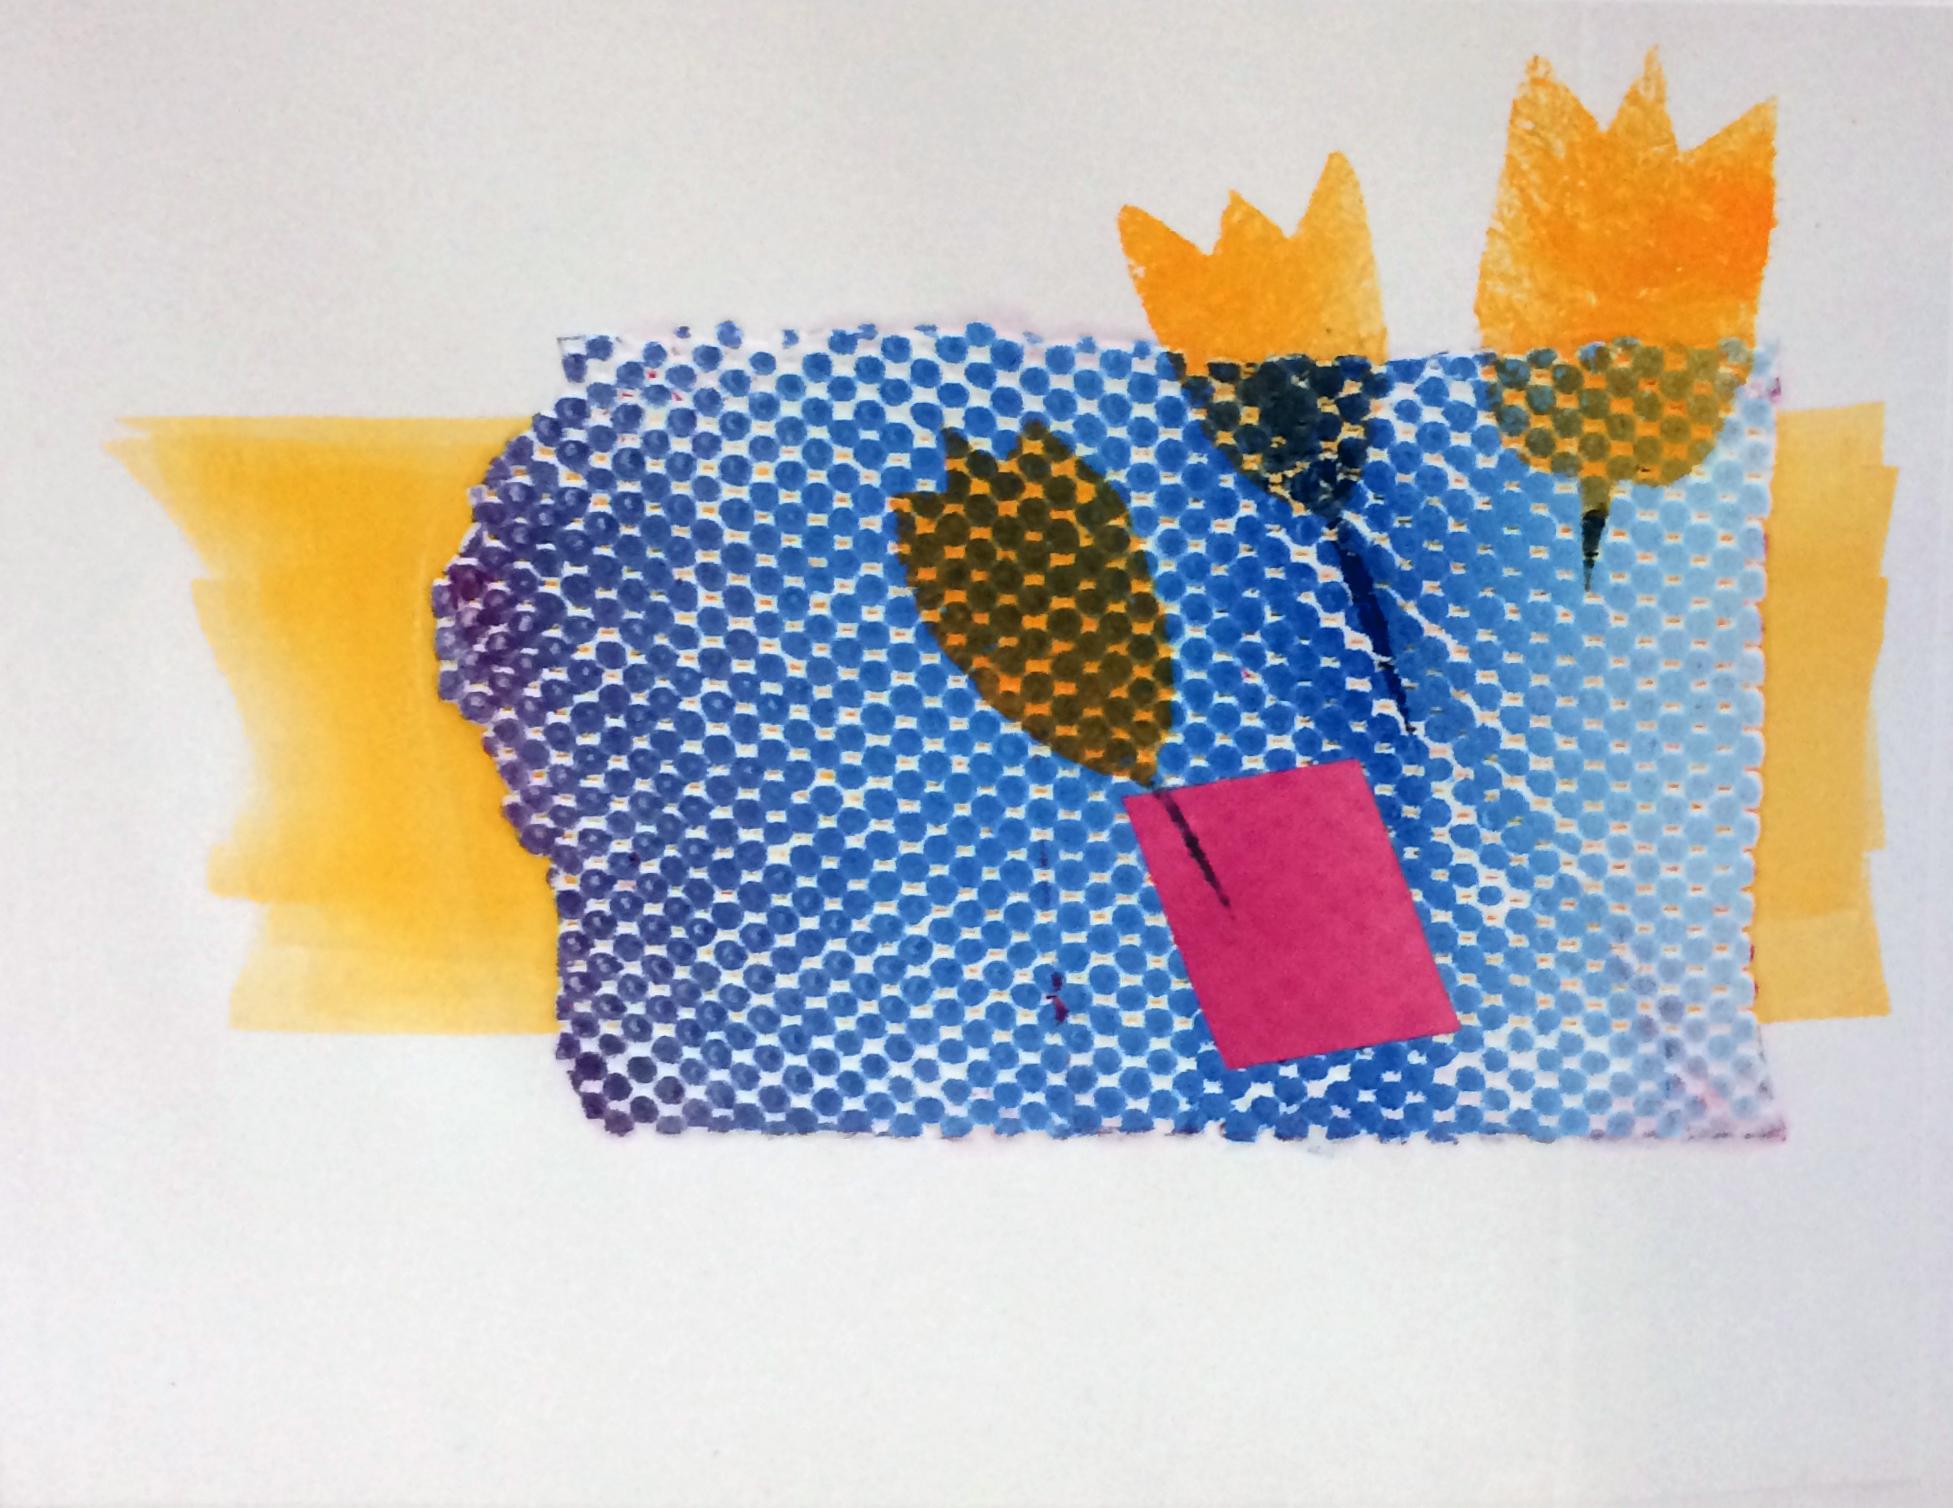 Renee Santhouse, monoprint